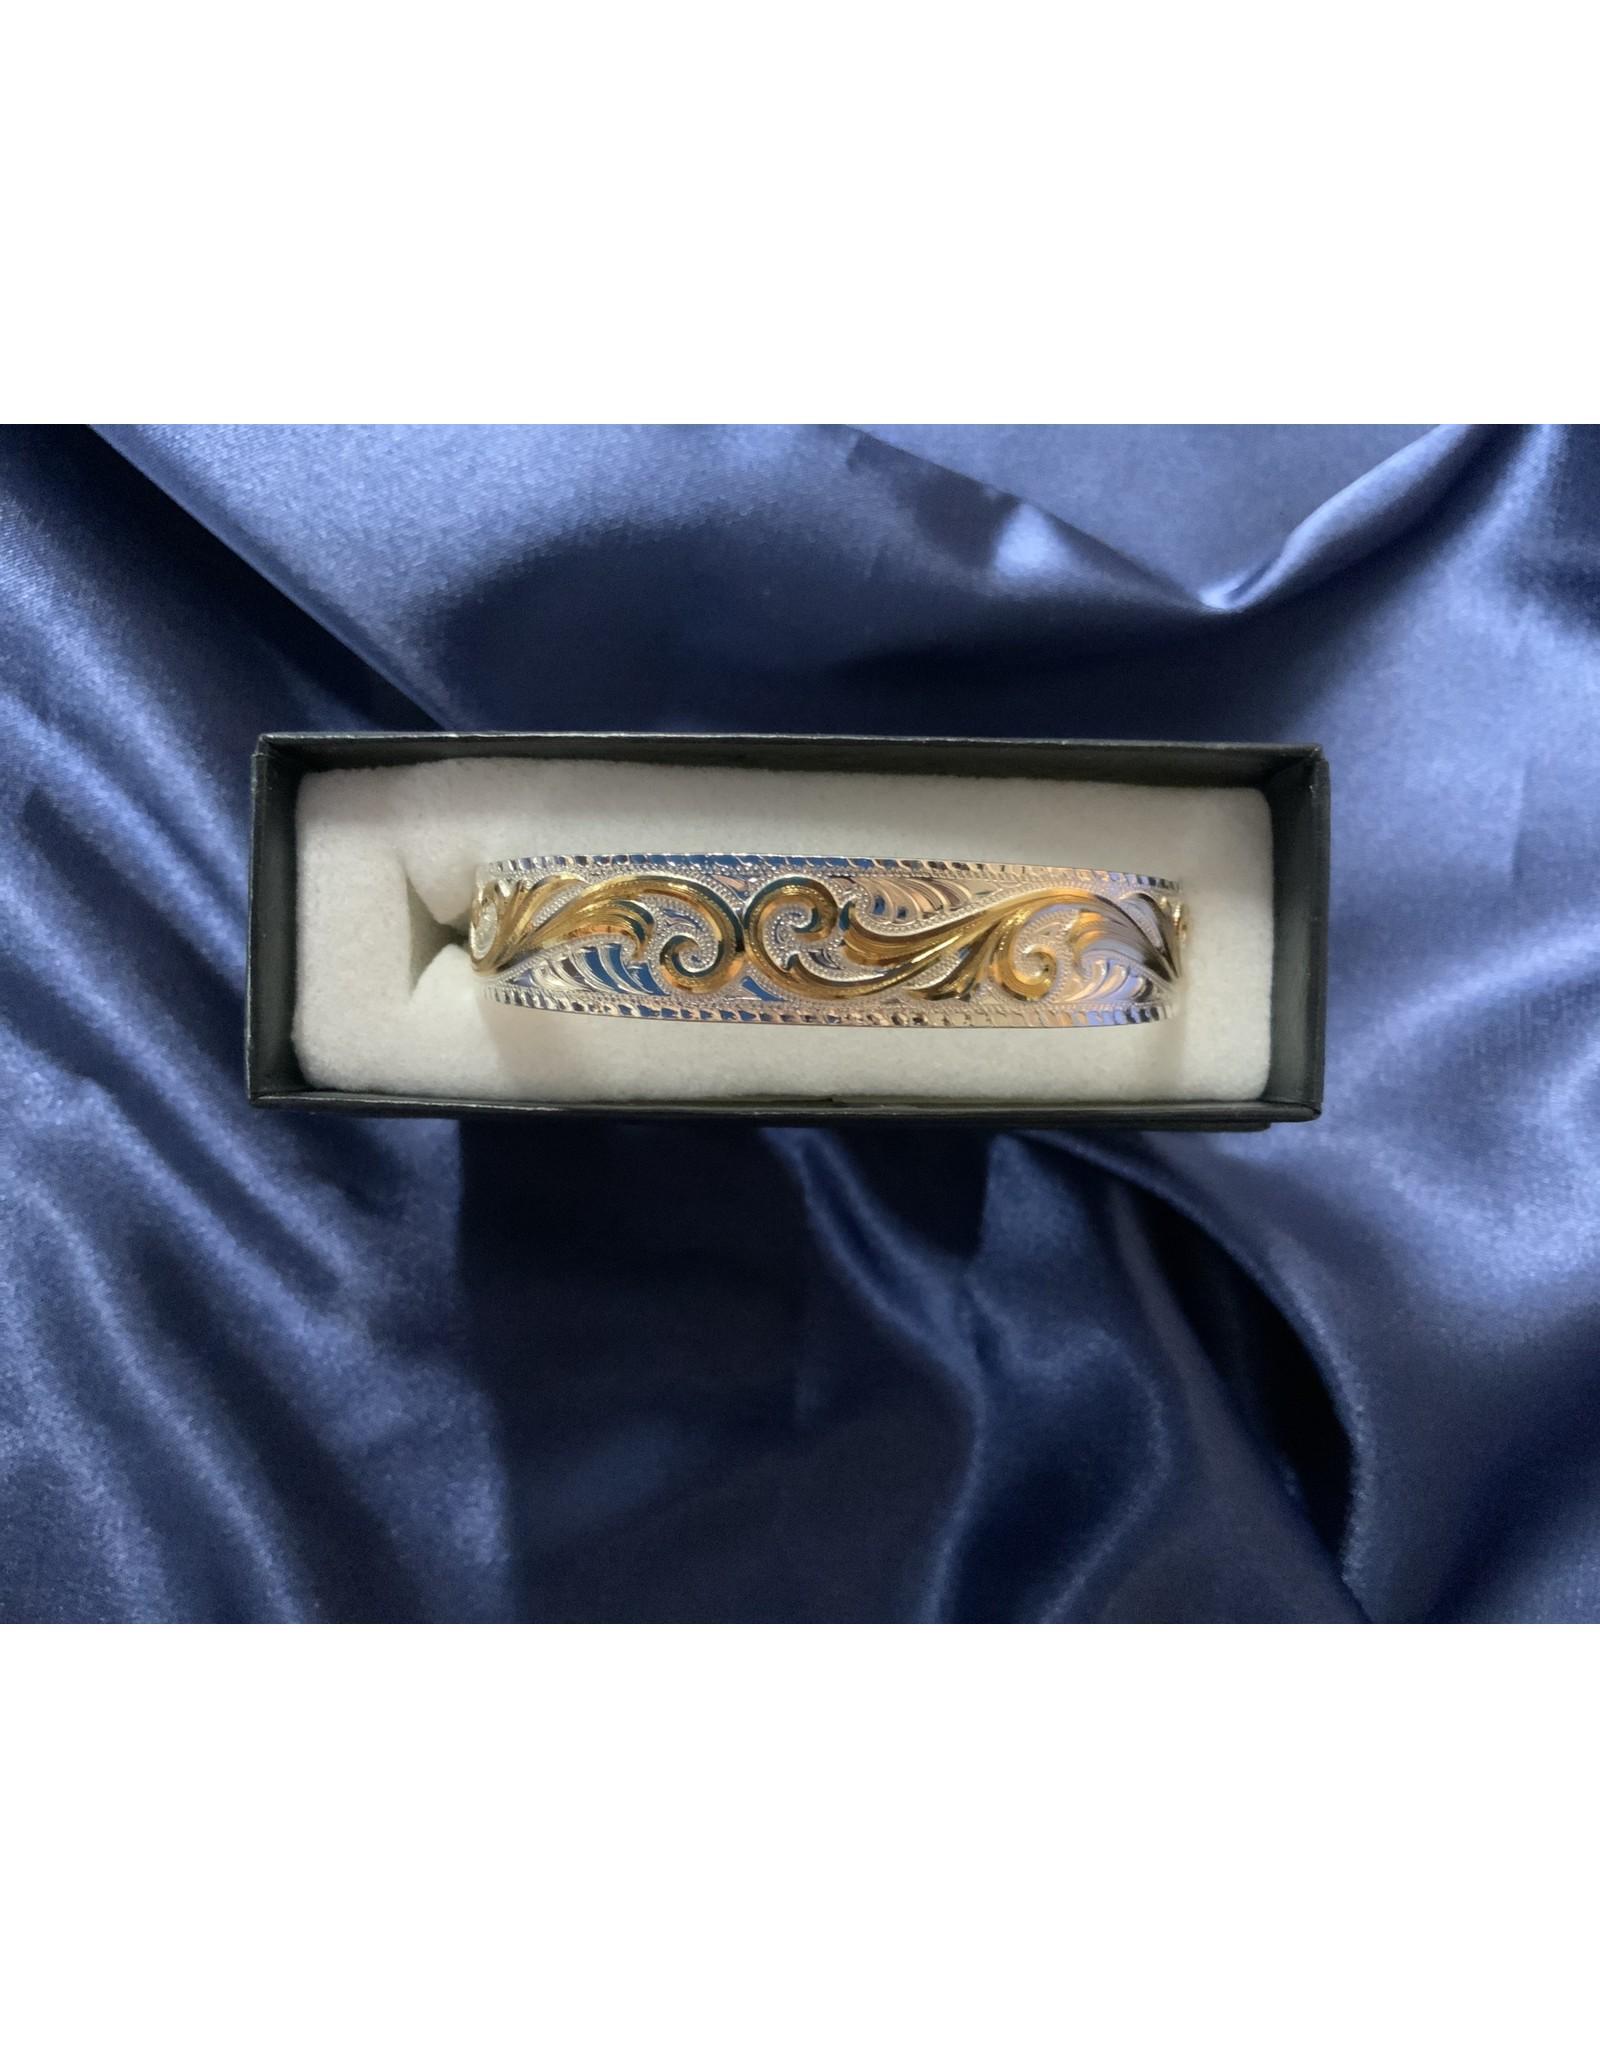 Bracelet 2T Tappered Scroll BC861